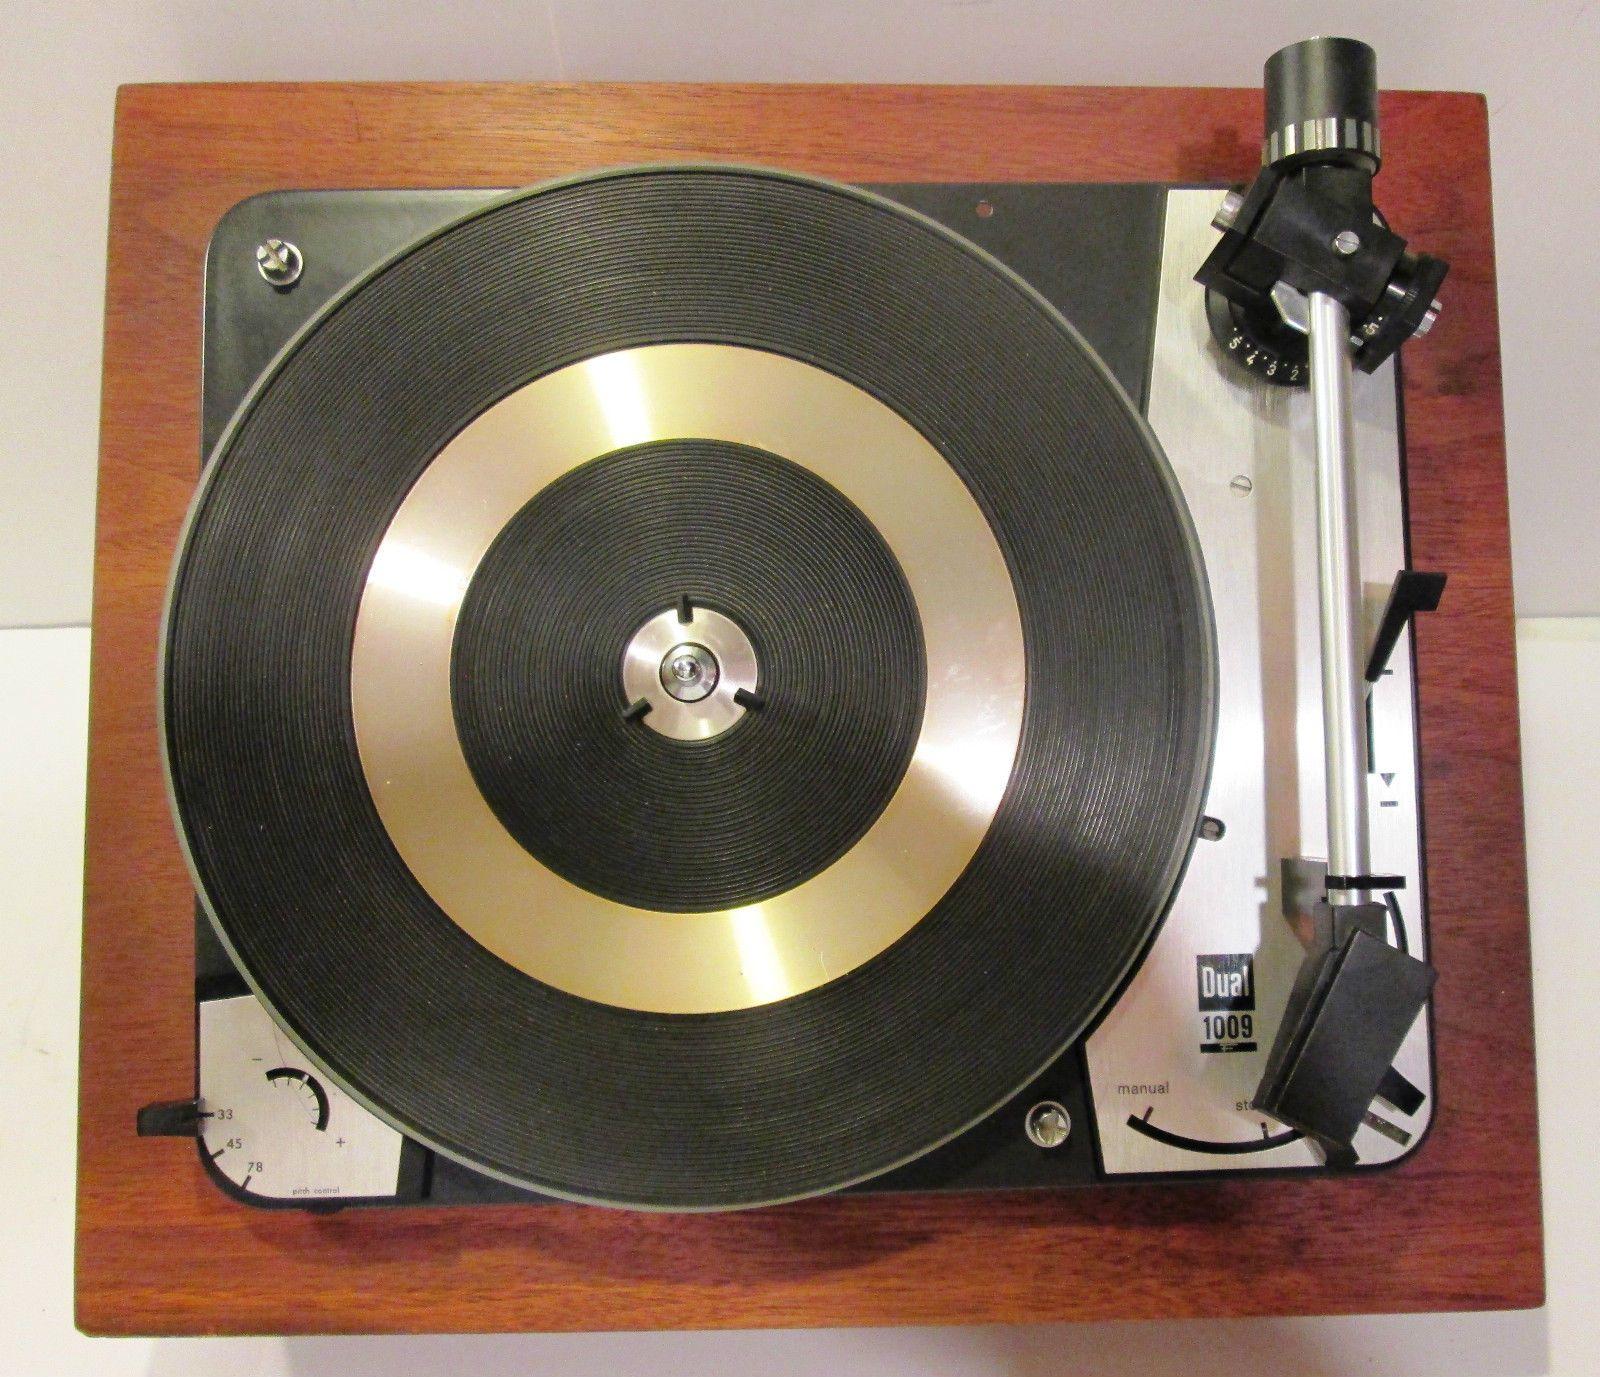 Very Nice Vintage Dual 1009 Turntable Wood Base Dust Cover